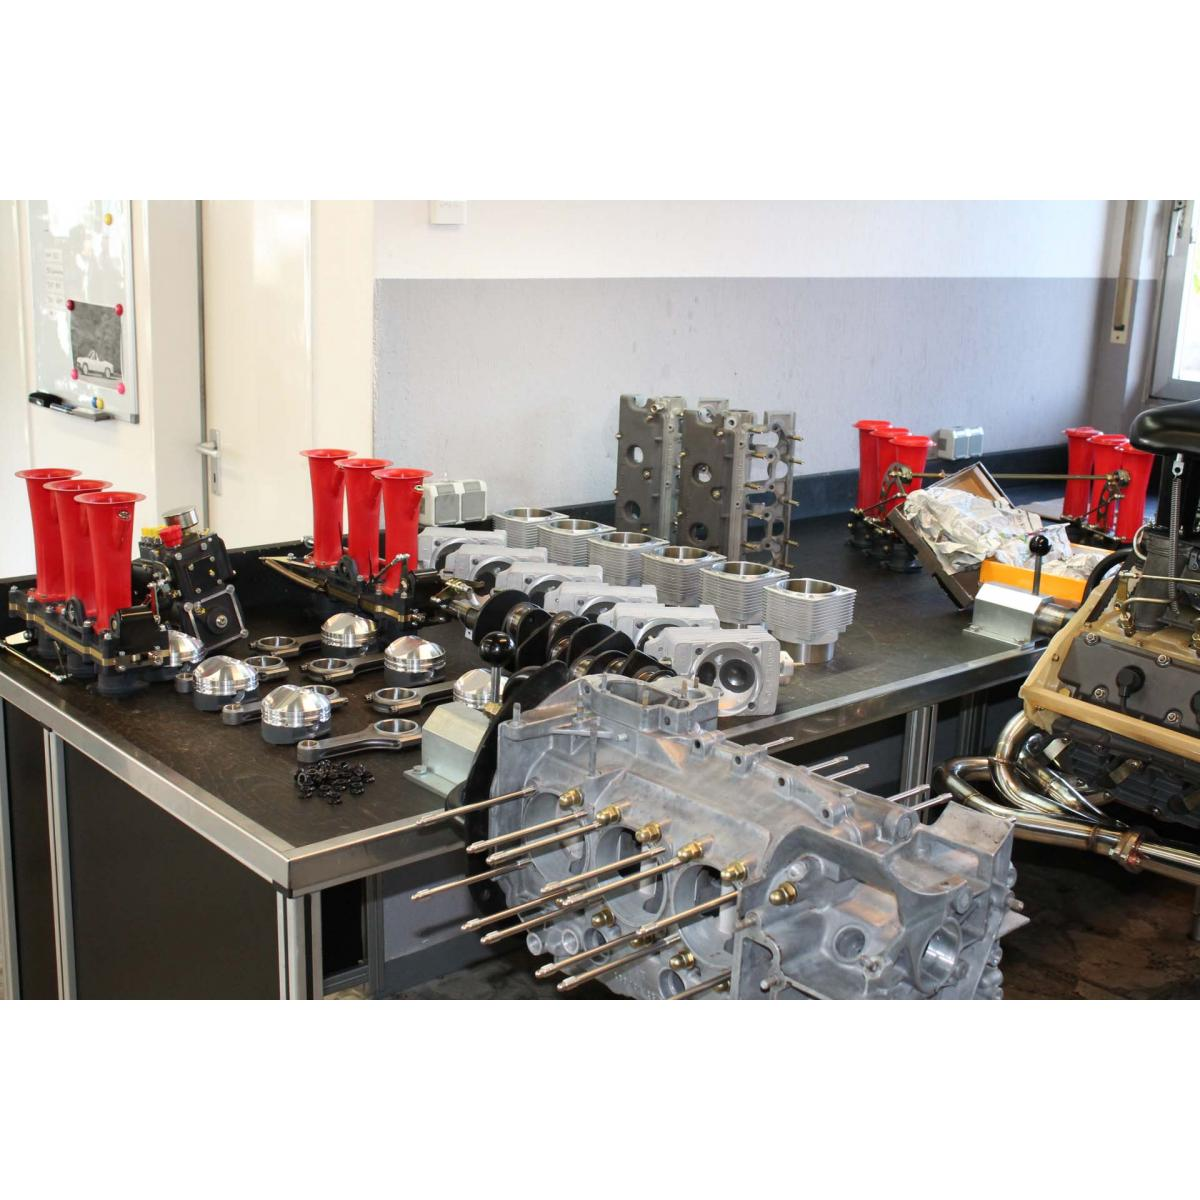 "Motor komplett, 3,0 RSR ""FIA group 4"", 352 PS/ 338 Nm"